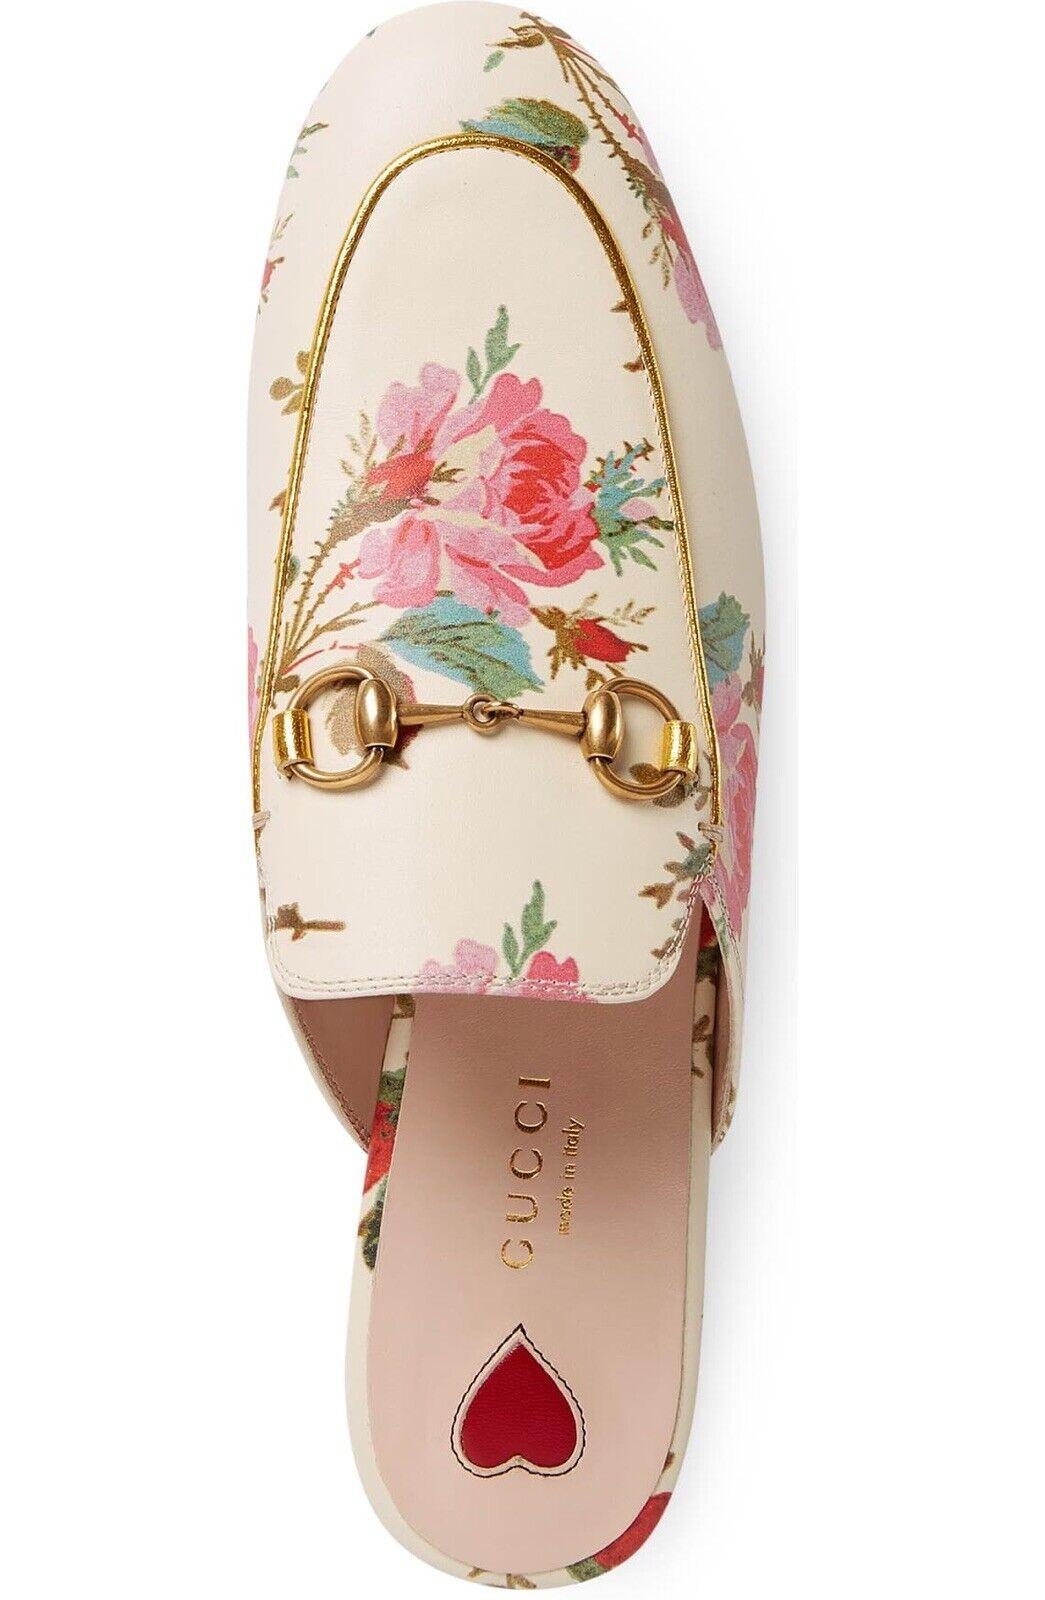 Rare Gucci Women Princetown Rose Floral Loafer Mu… - image 2